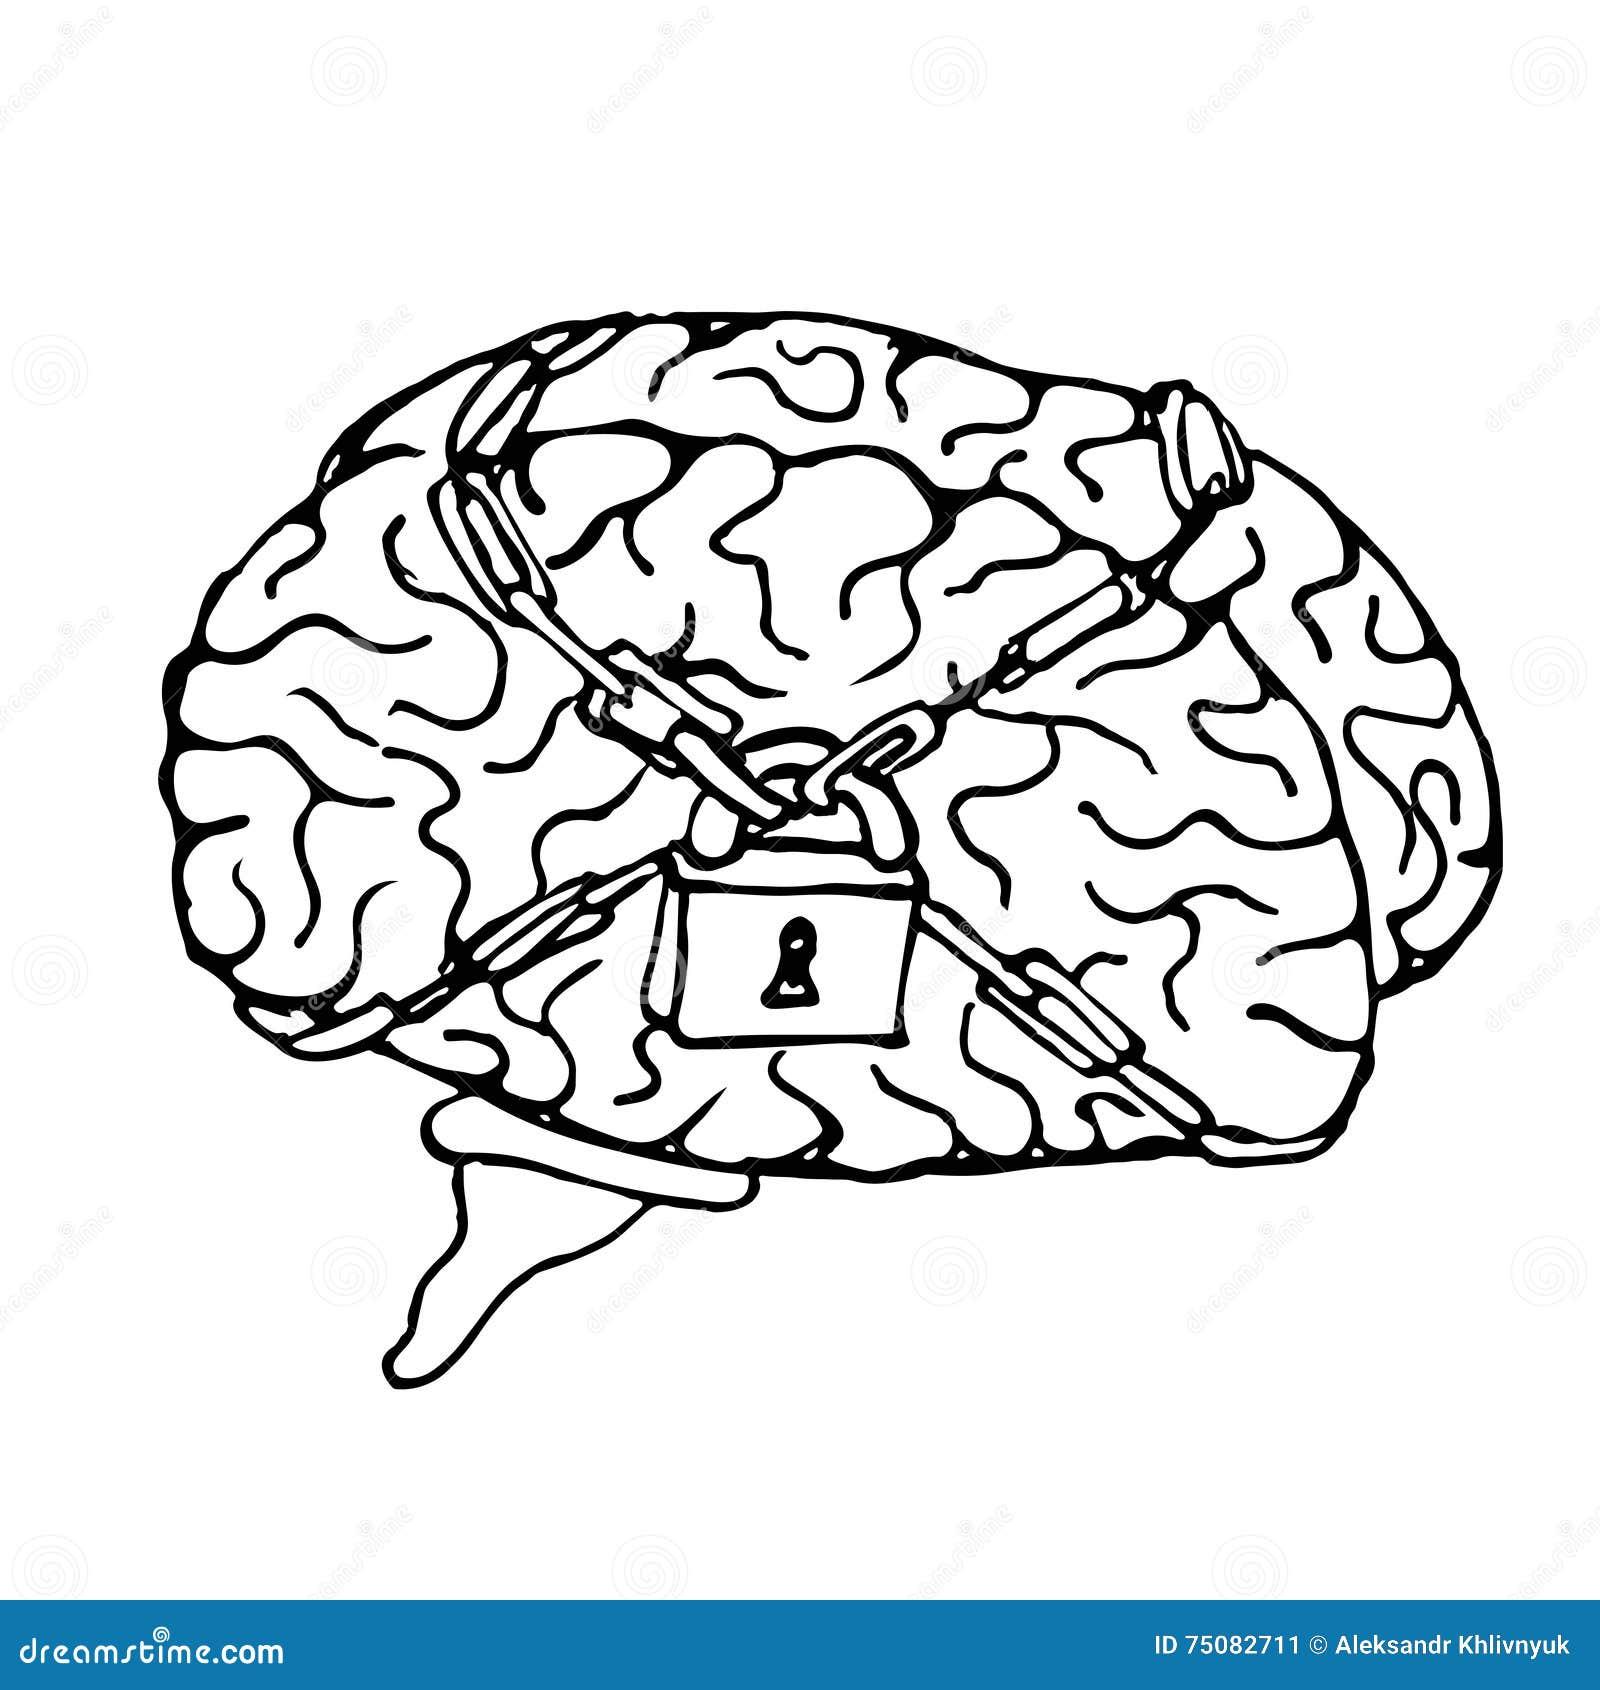 Intellectual Property Cartoon: World Intellectual Property Day Greeting Emblem Cartoon